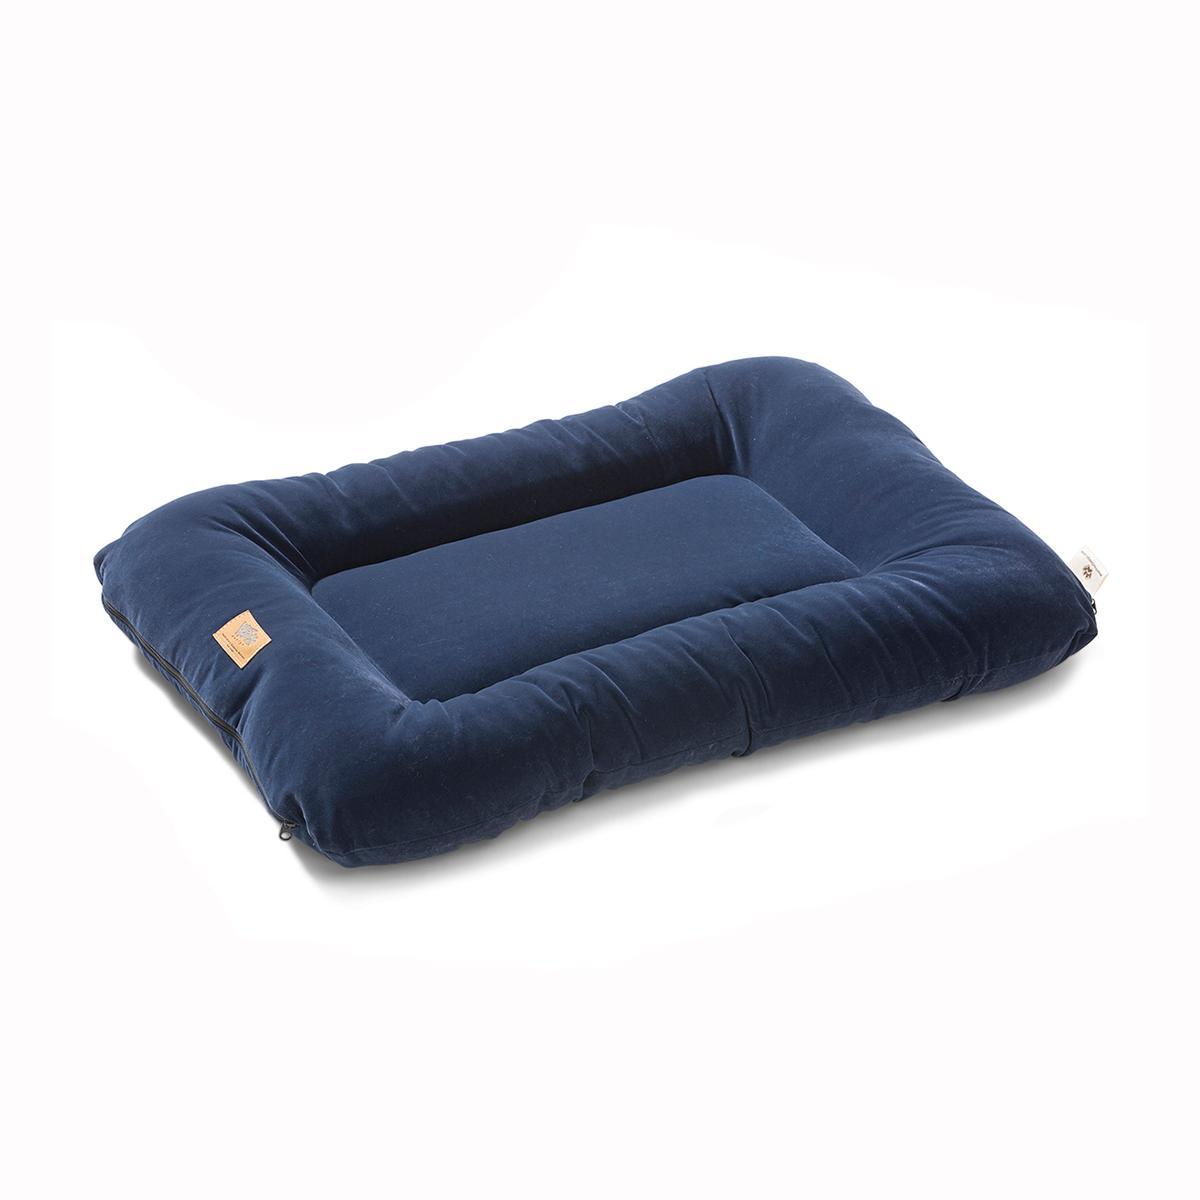 Heyday Dog Bed - Midnight